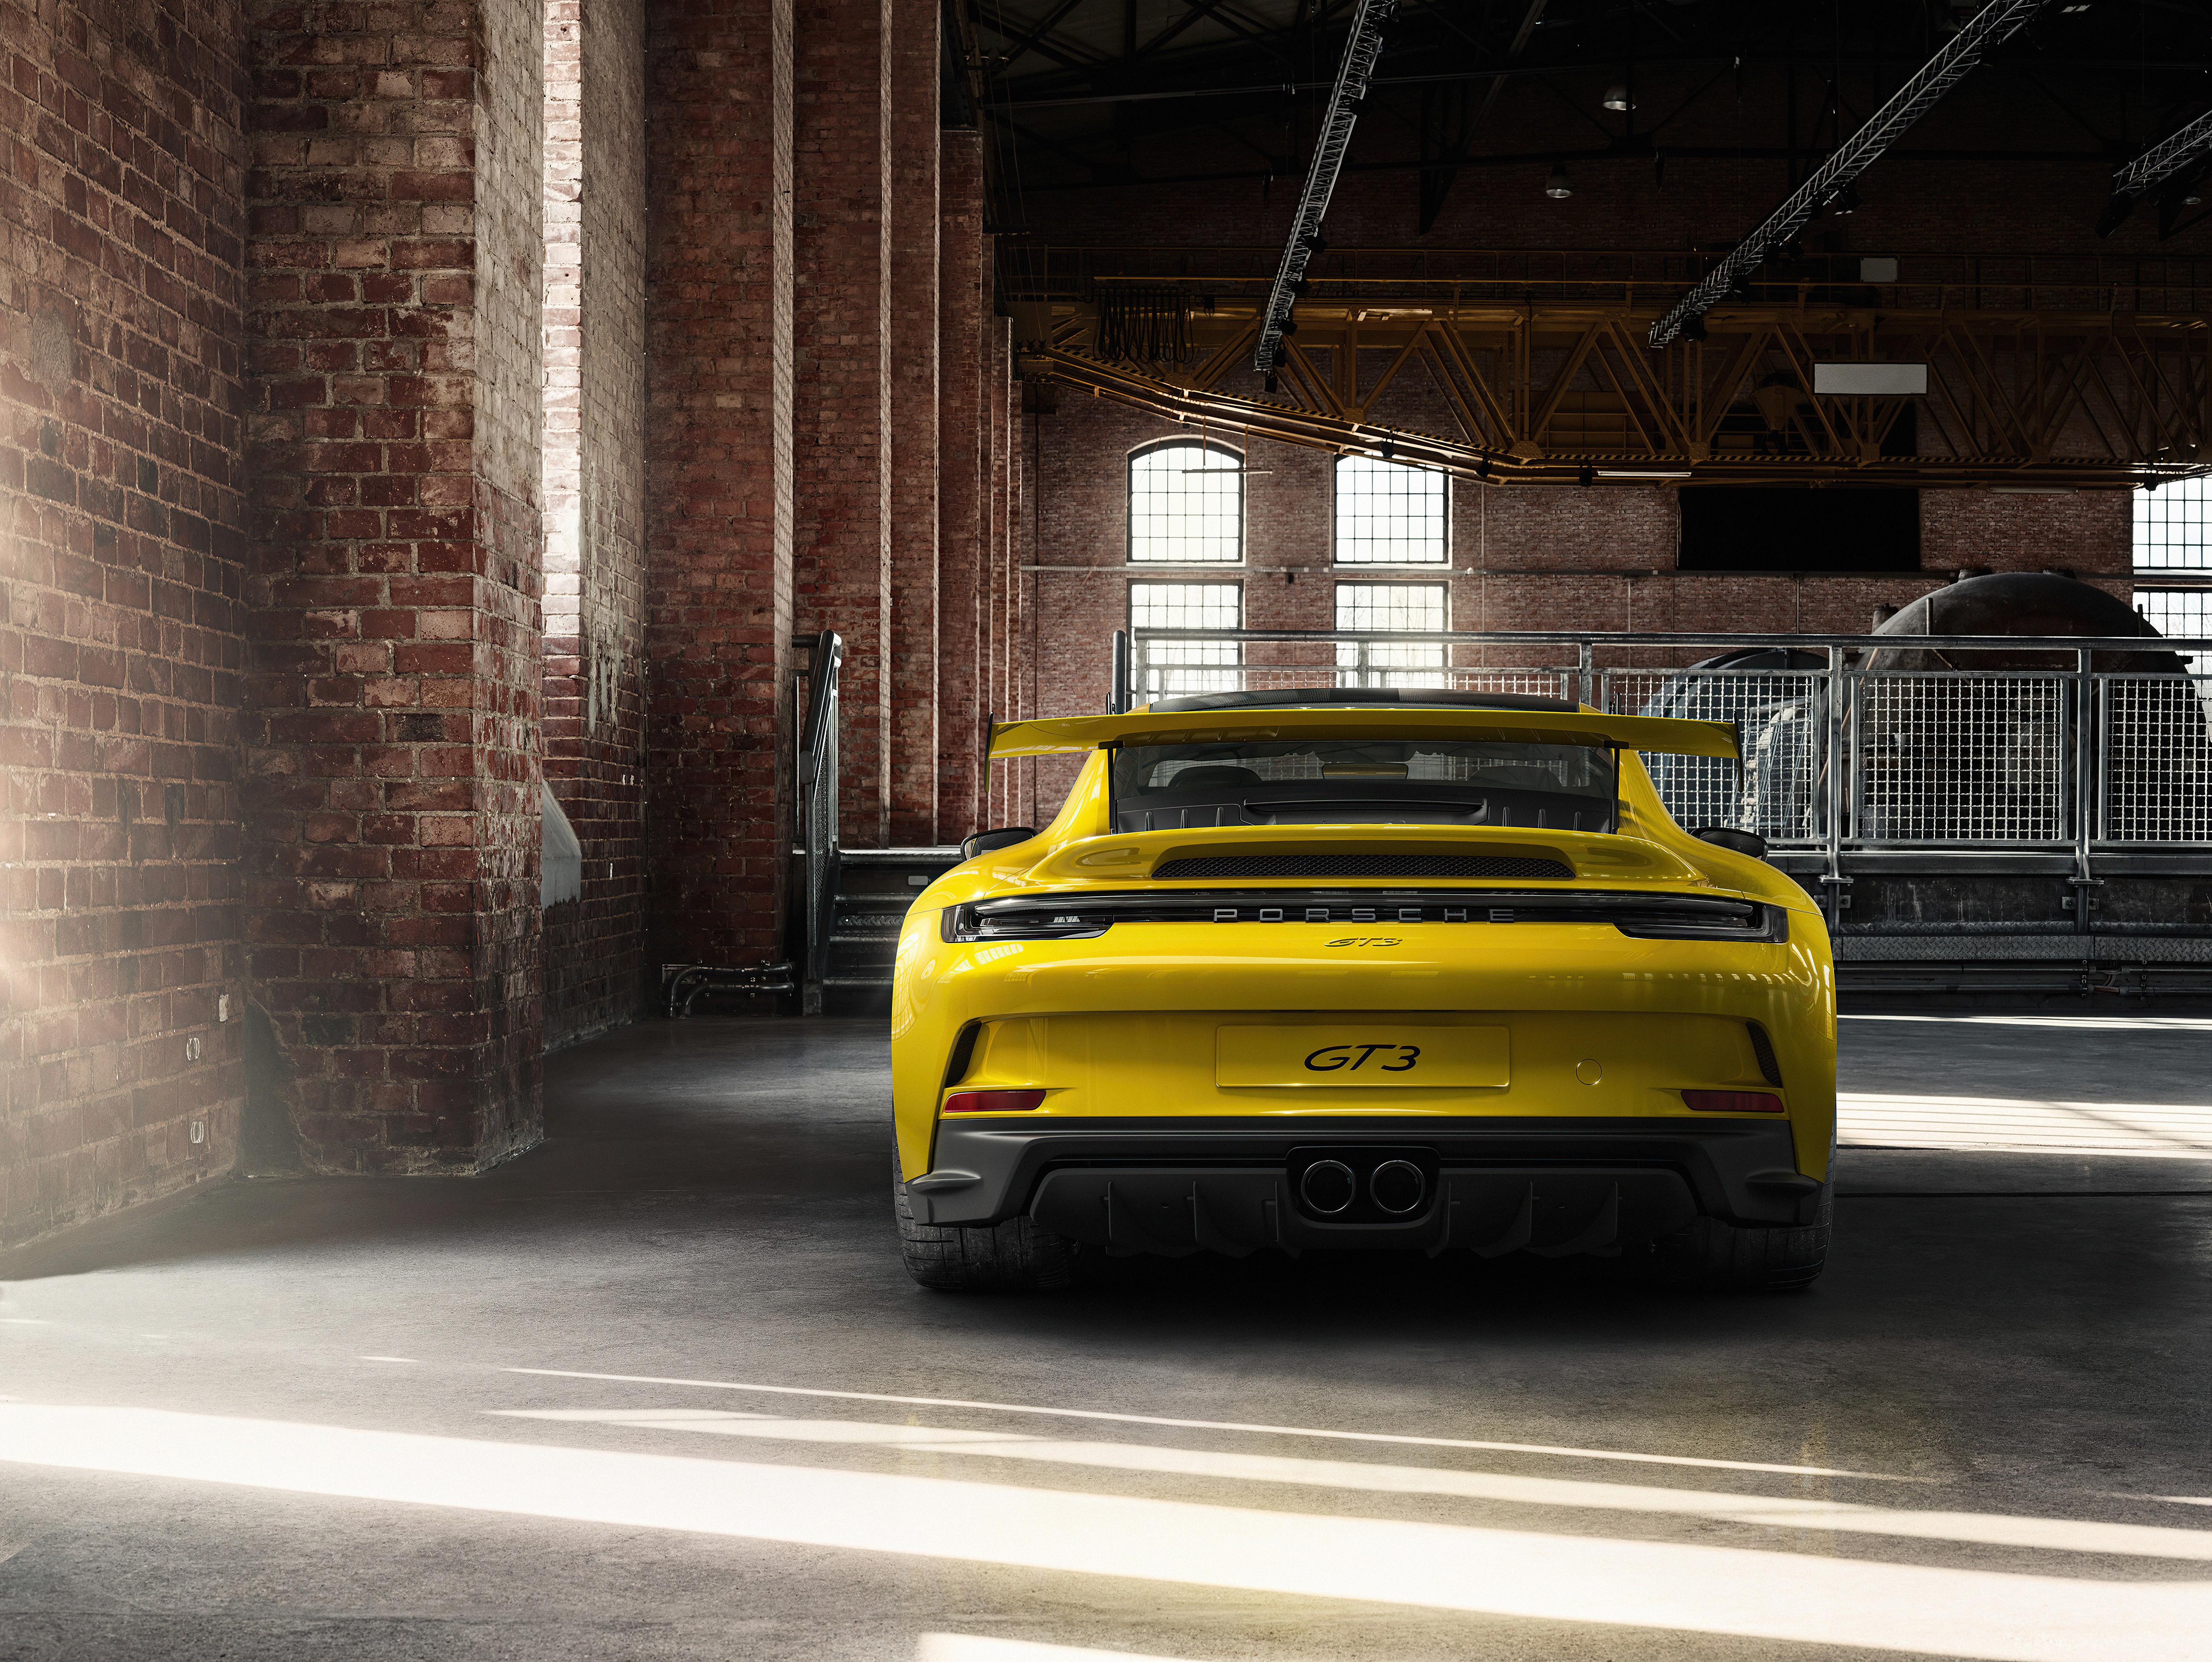 porsche 911 gt3 exclusive 4k 1620171616 - Porsche 911 GT3 Exclusive 4k - Porsche 911 GT3 Exclusive 4k wallpapers